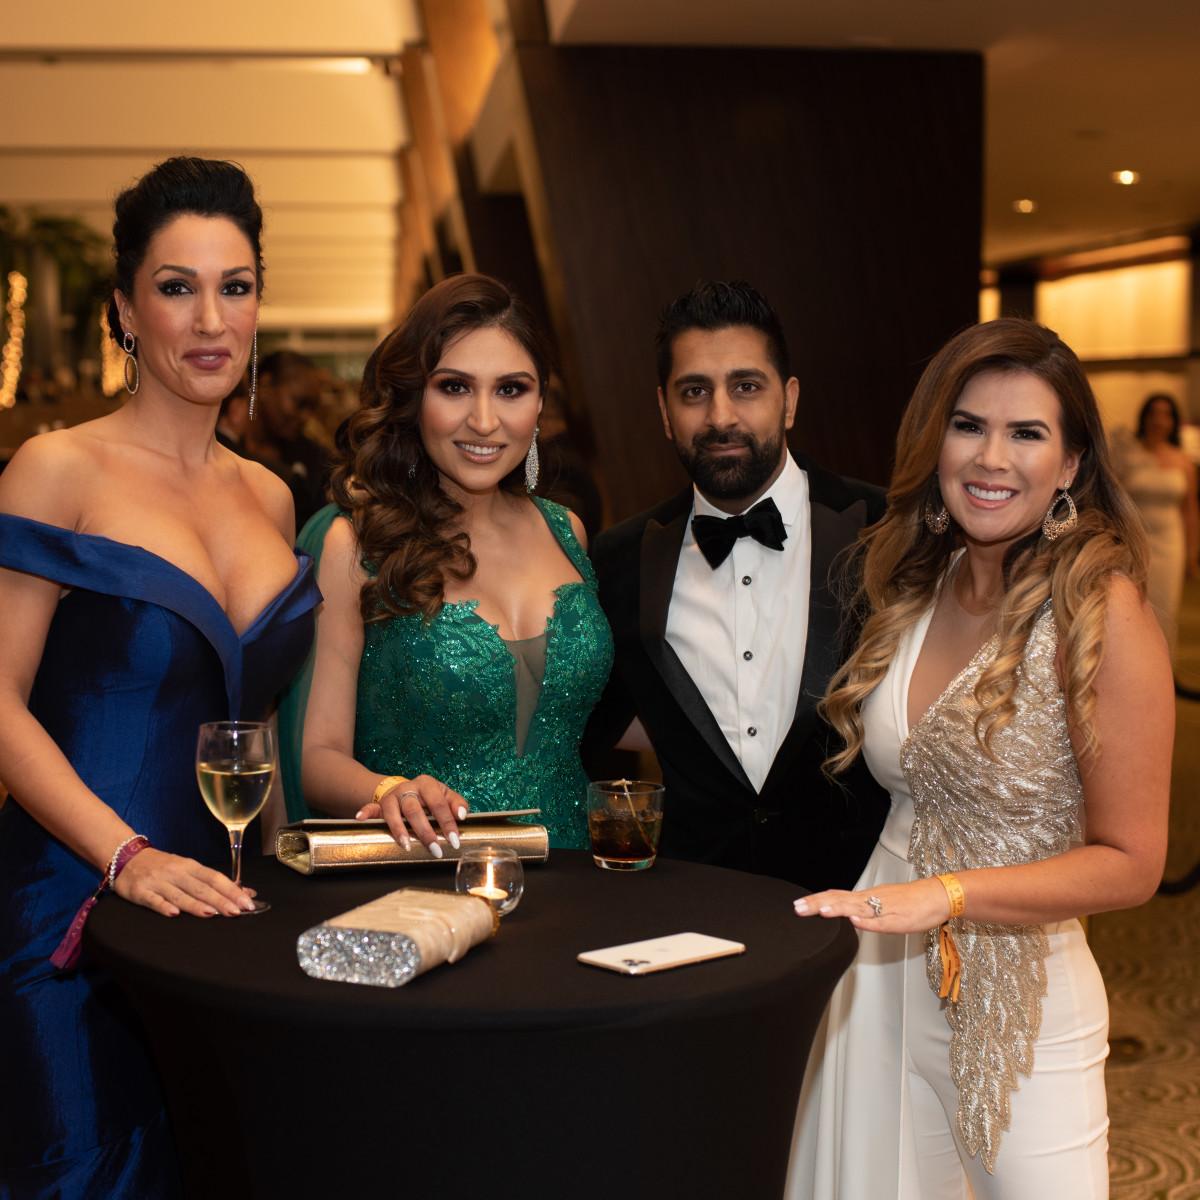 Altus Gala 2019 Hira Khan, Nuruddin Ali, & Vanessa Montero